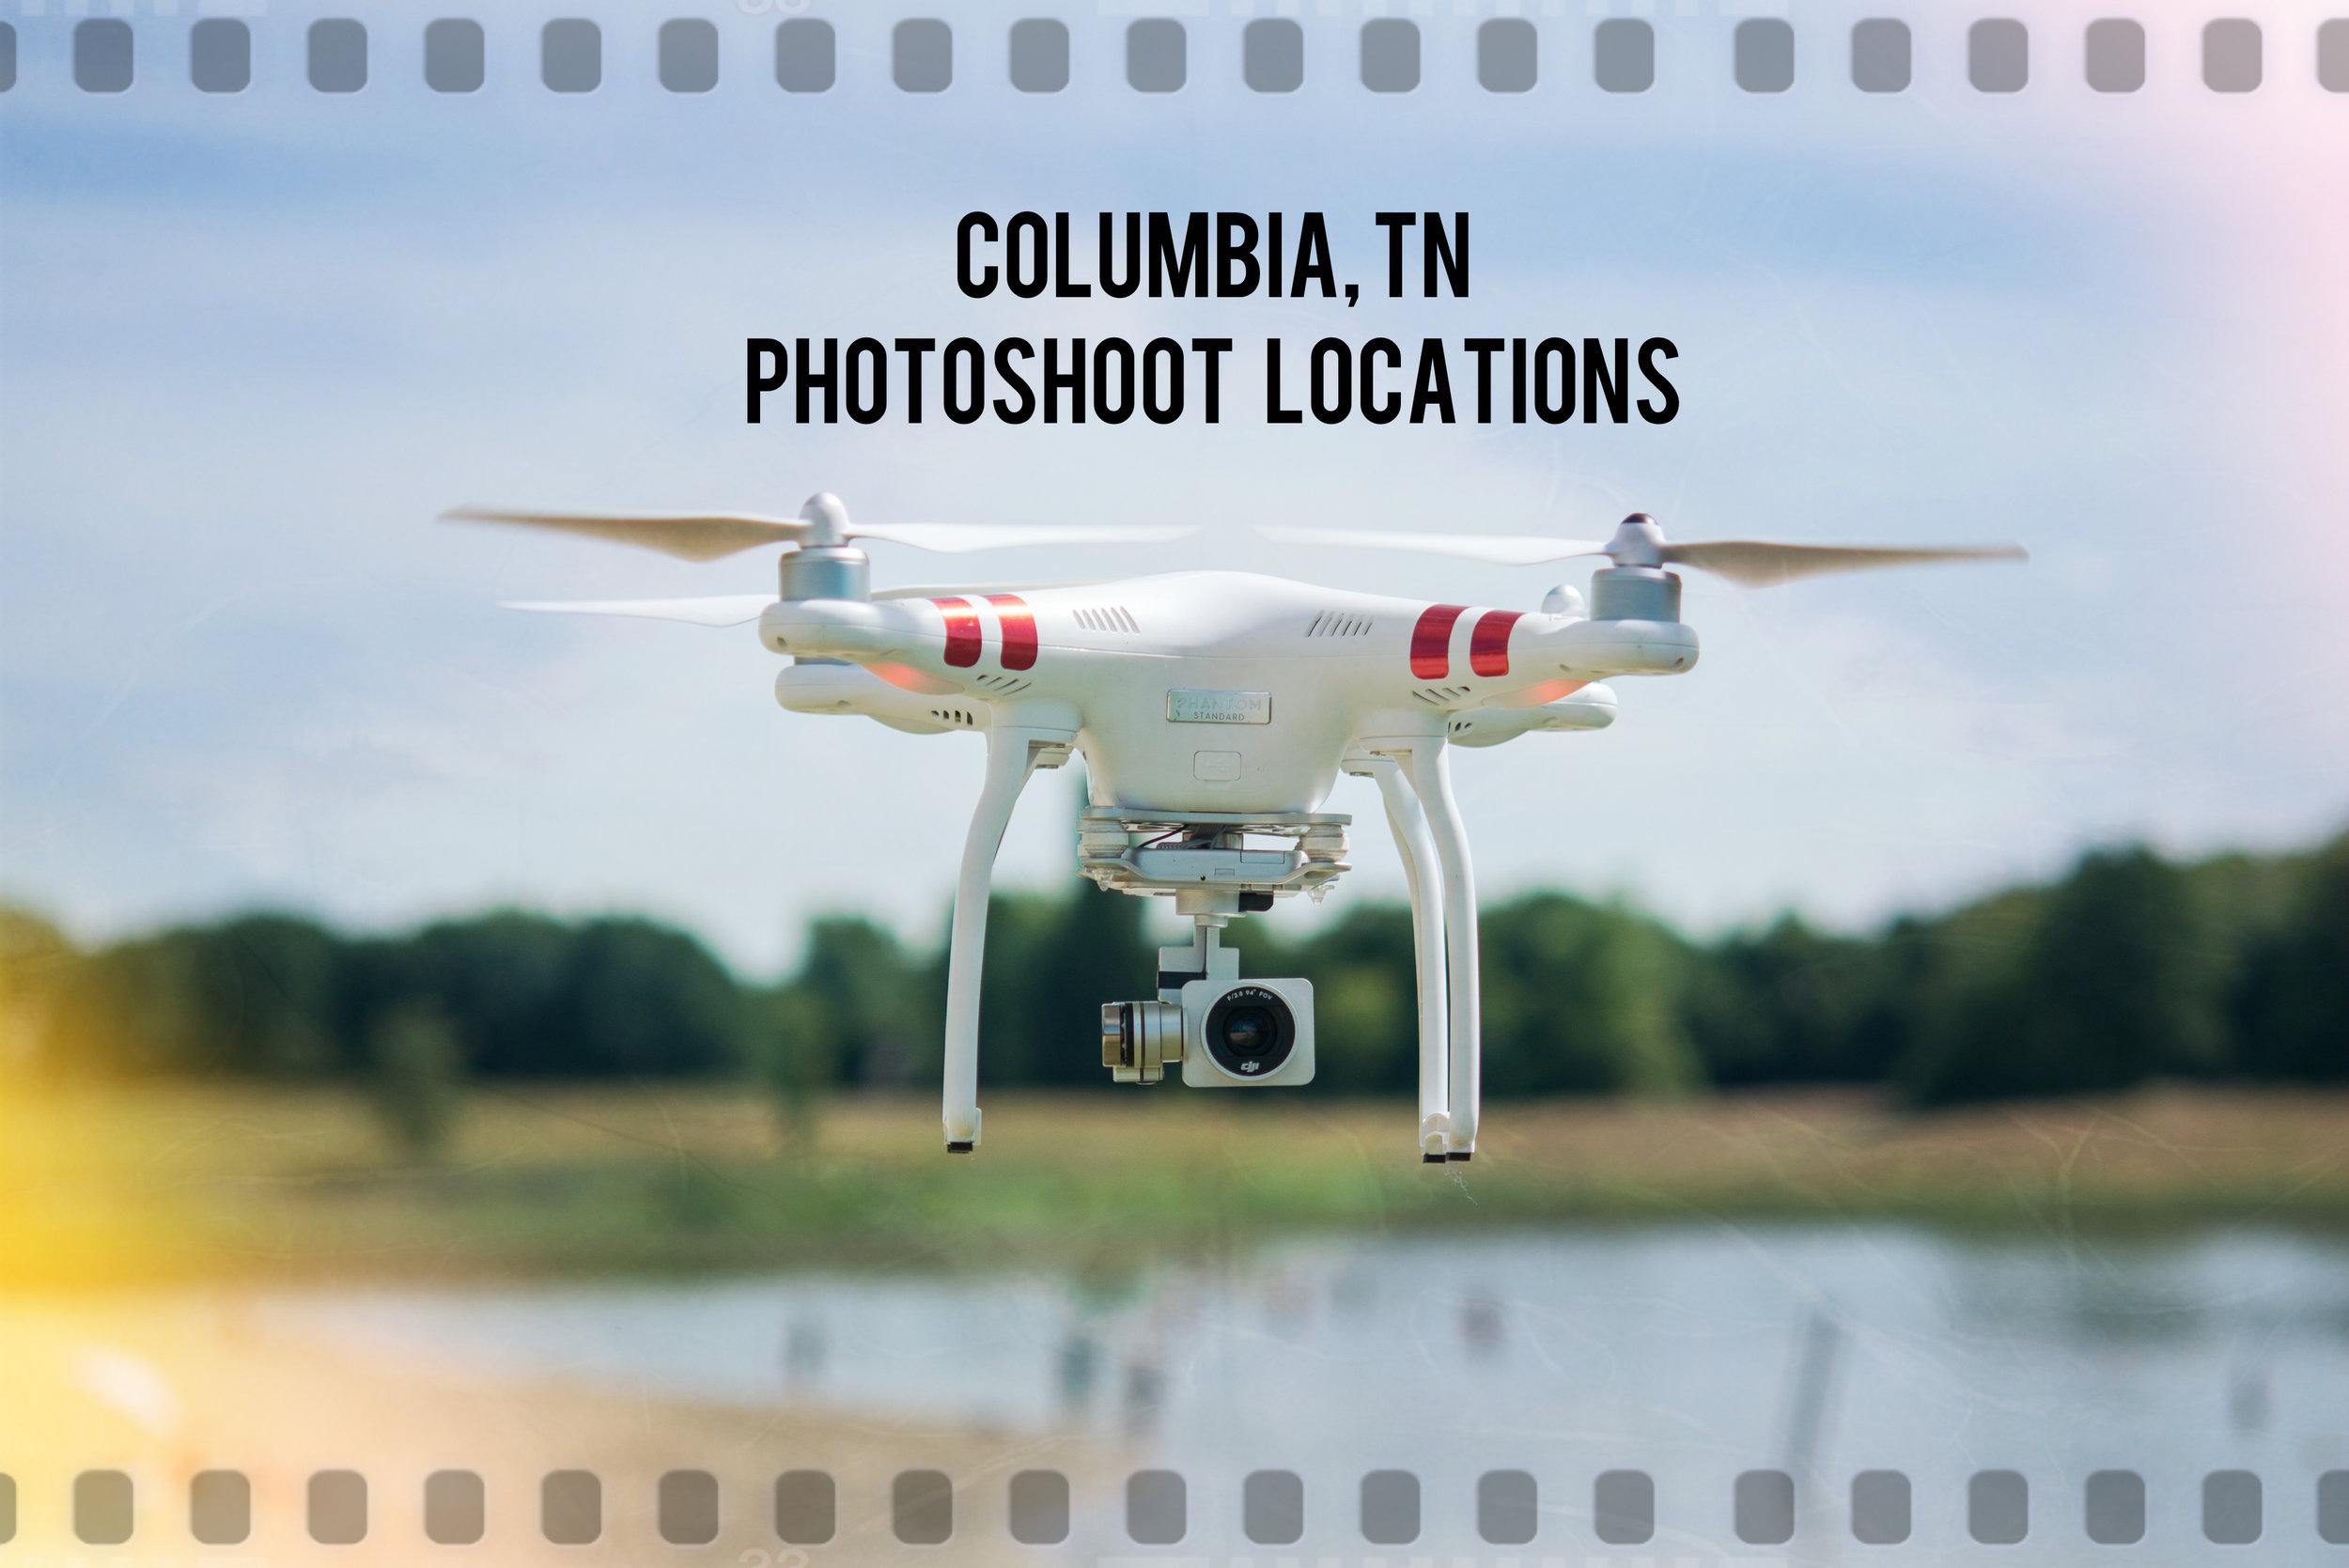 Columbia, TN Photoshoot Locations